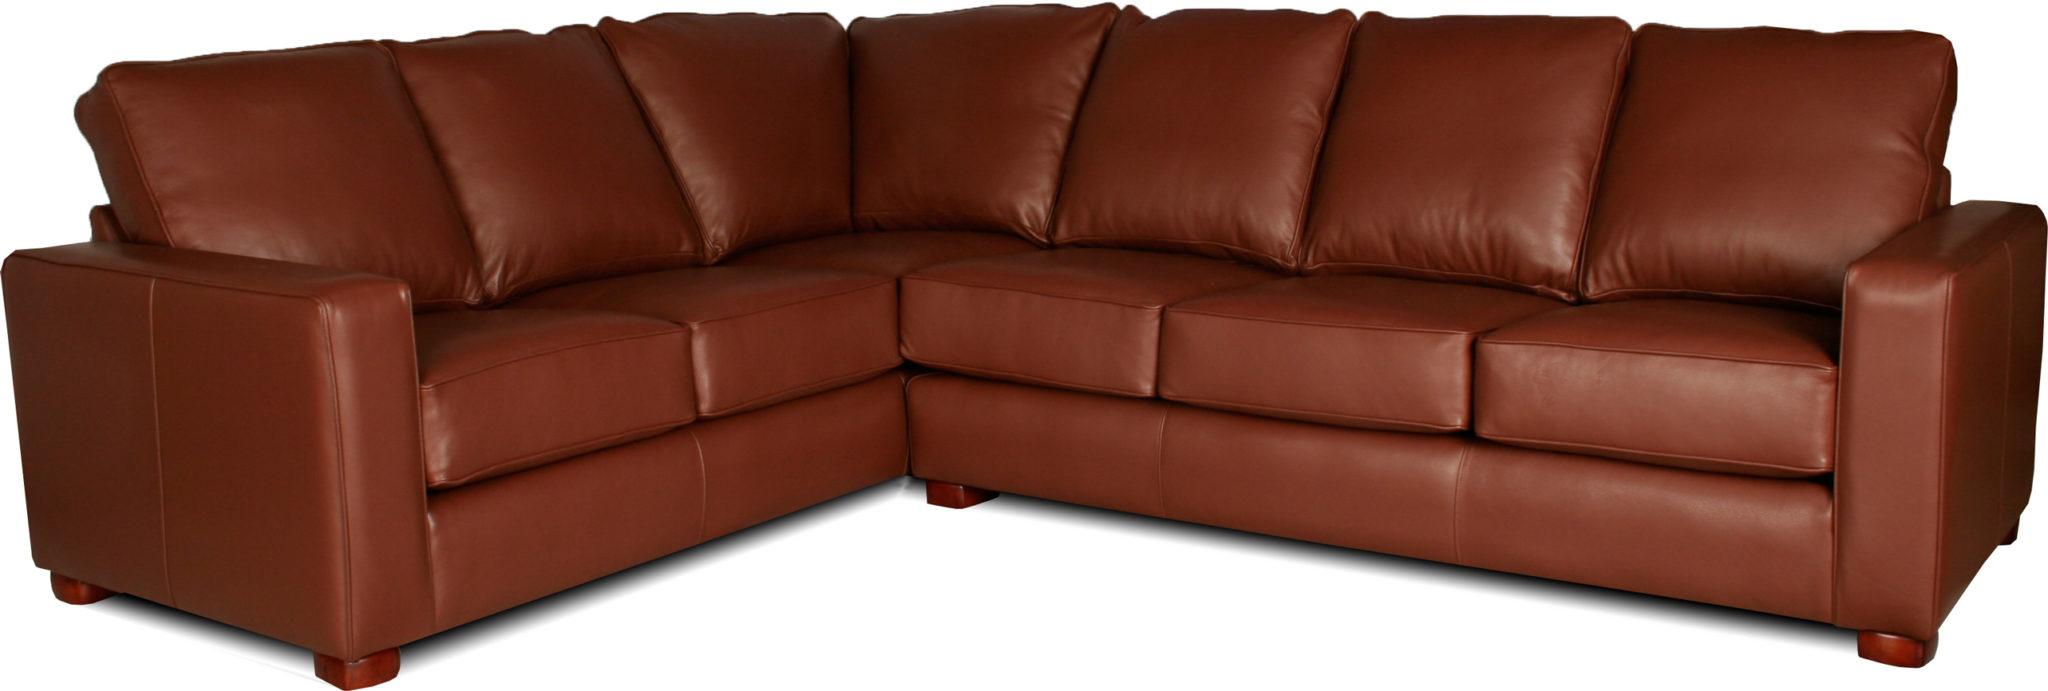 Charming Lorenz U2013 Leather Furniture